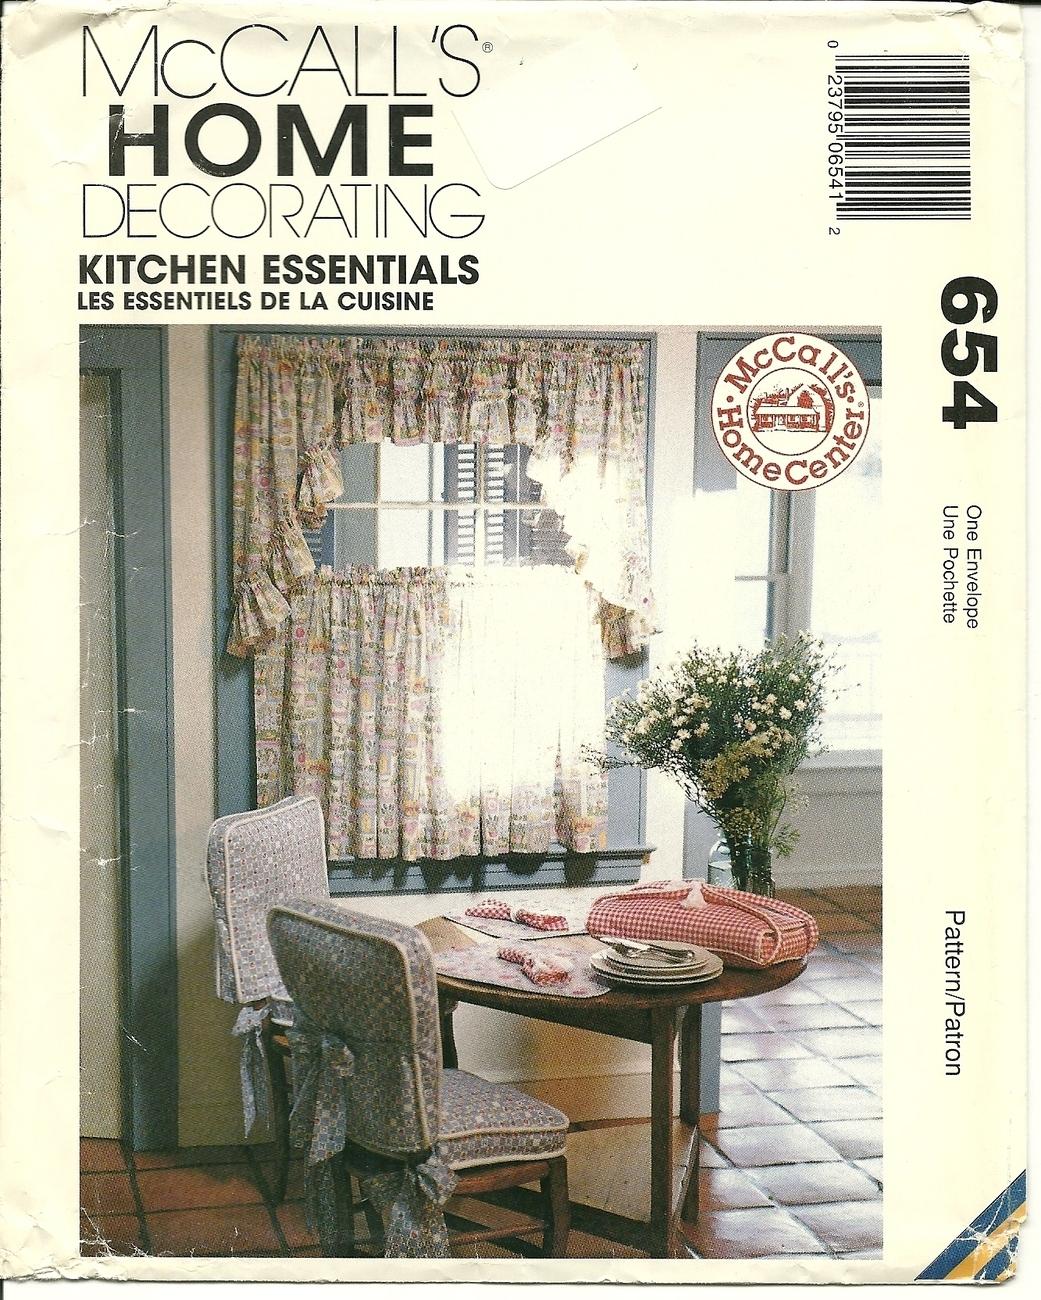 New Home Kitchen Essentials Home Decor